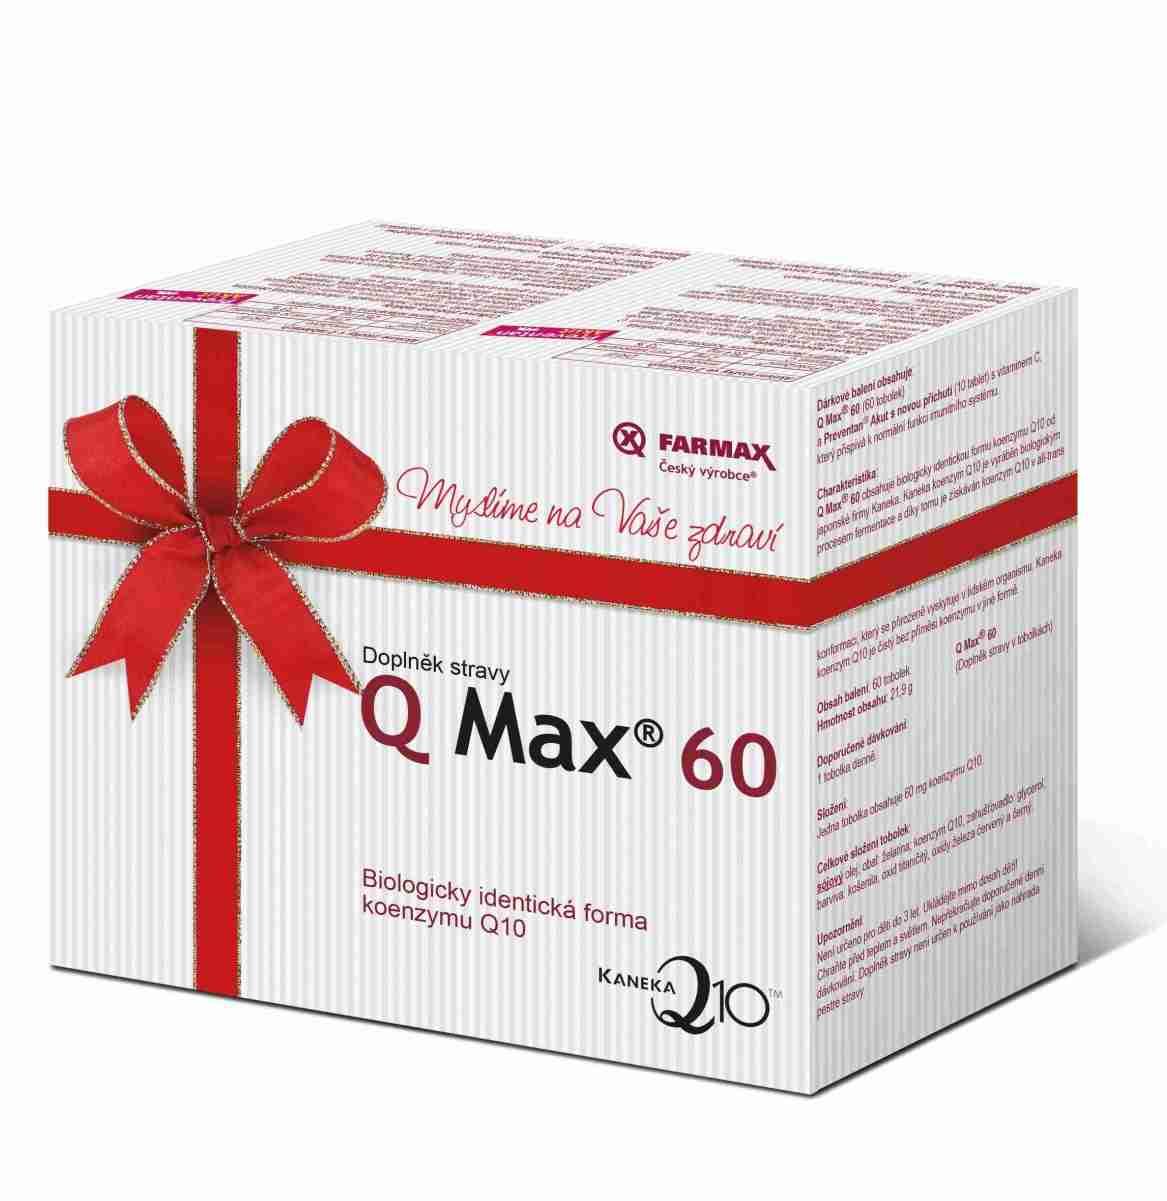 Farmax Q Max 60 60 tob. + Preventan Akut s novou příchutí 10 tbl. ZDARMA